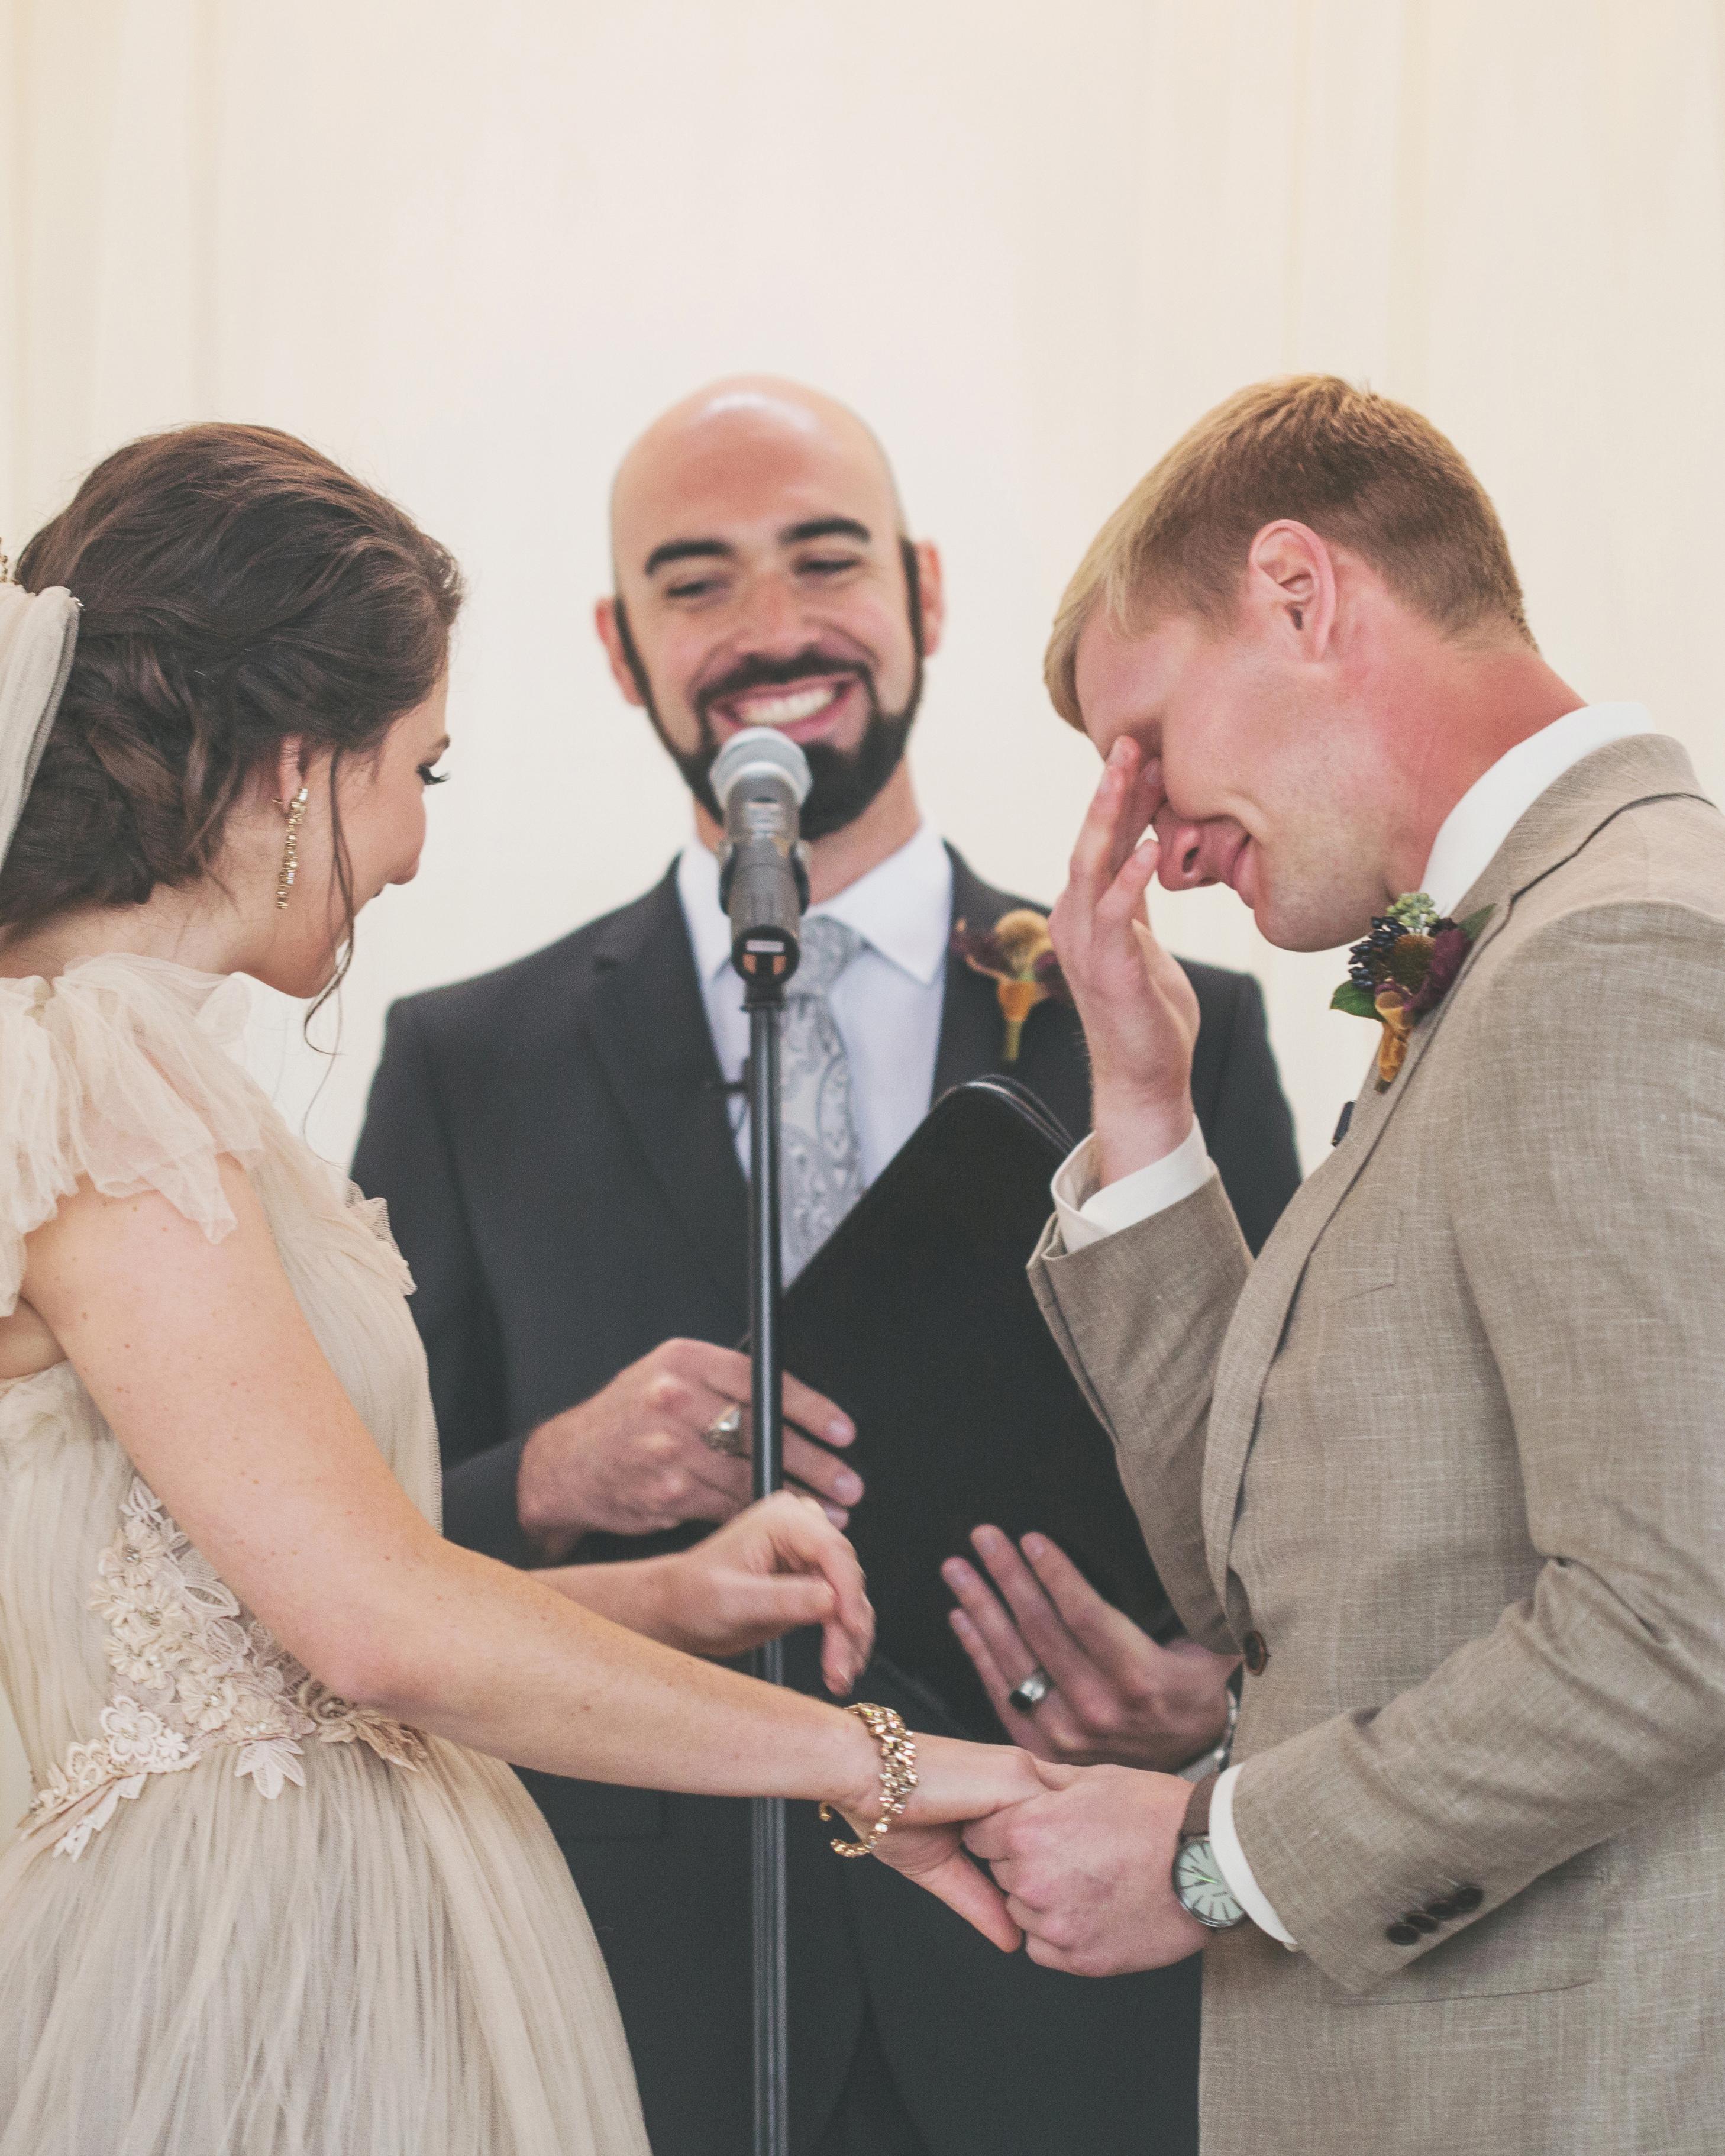 sara-matt-wedding-ceremony-2168-s111990-0715.jpg